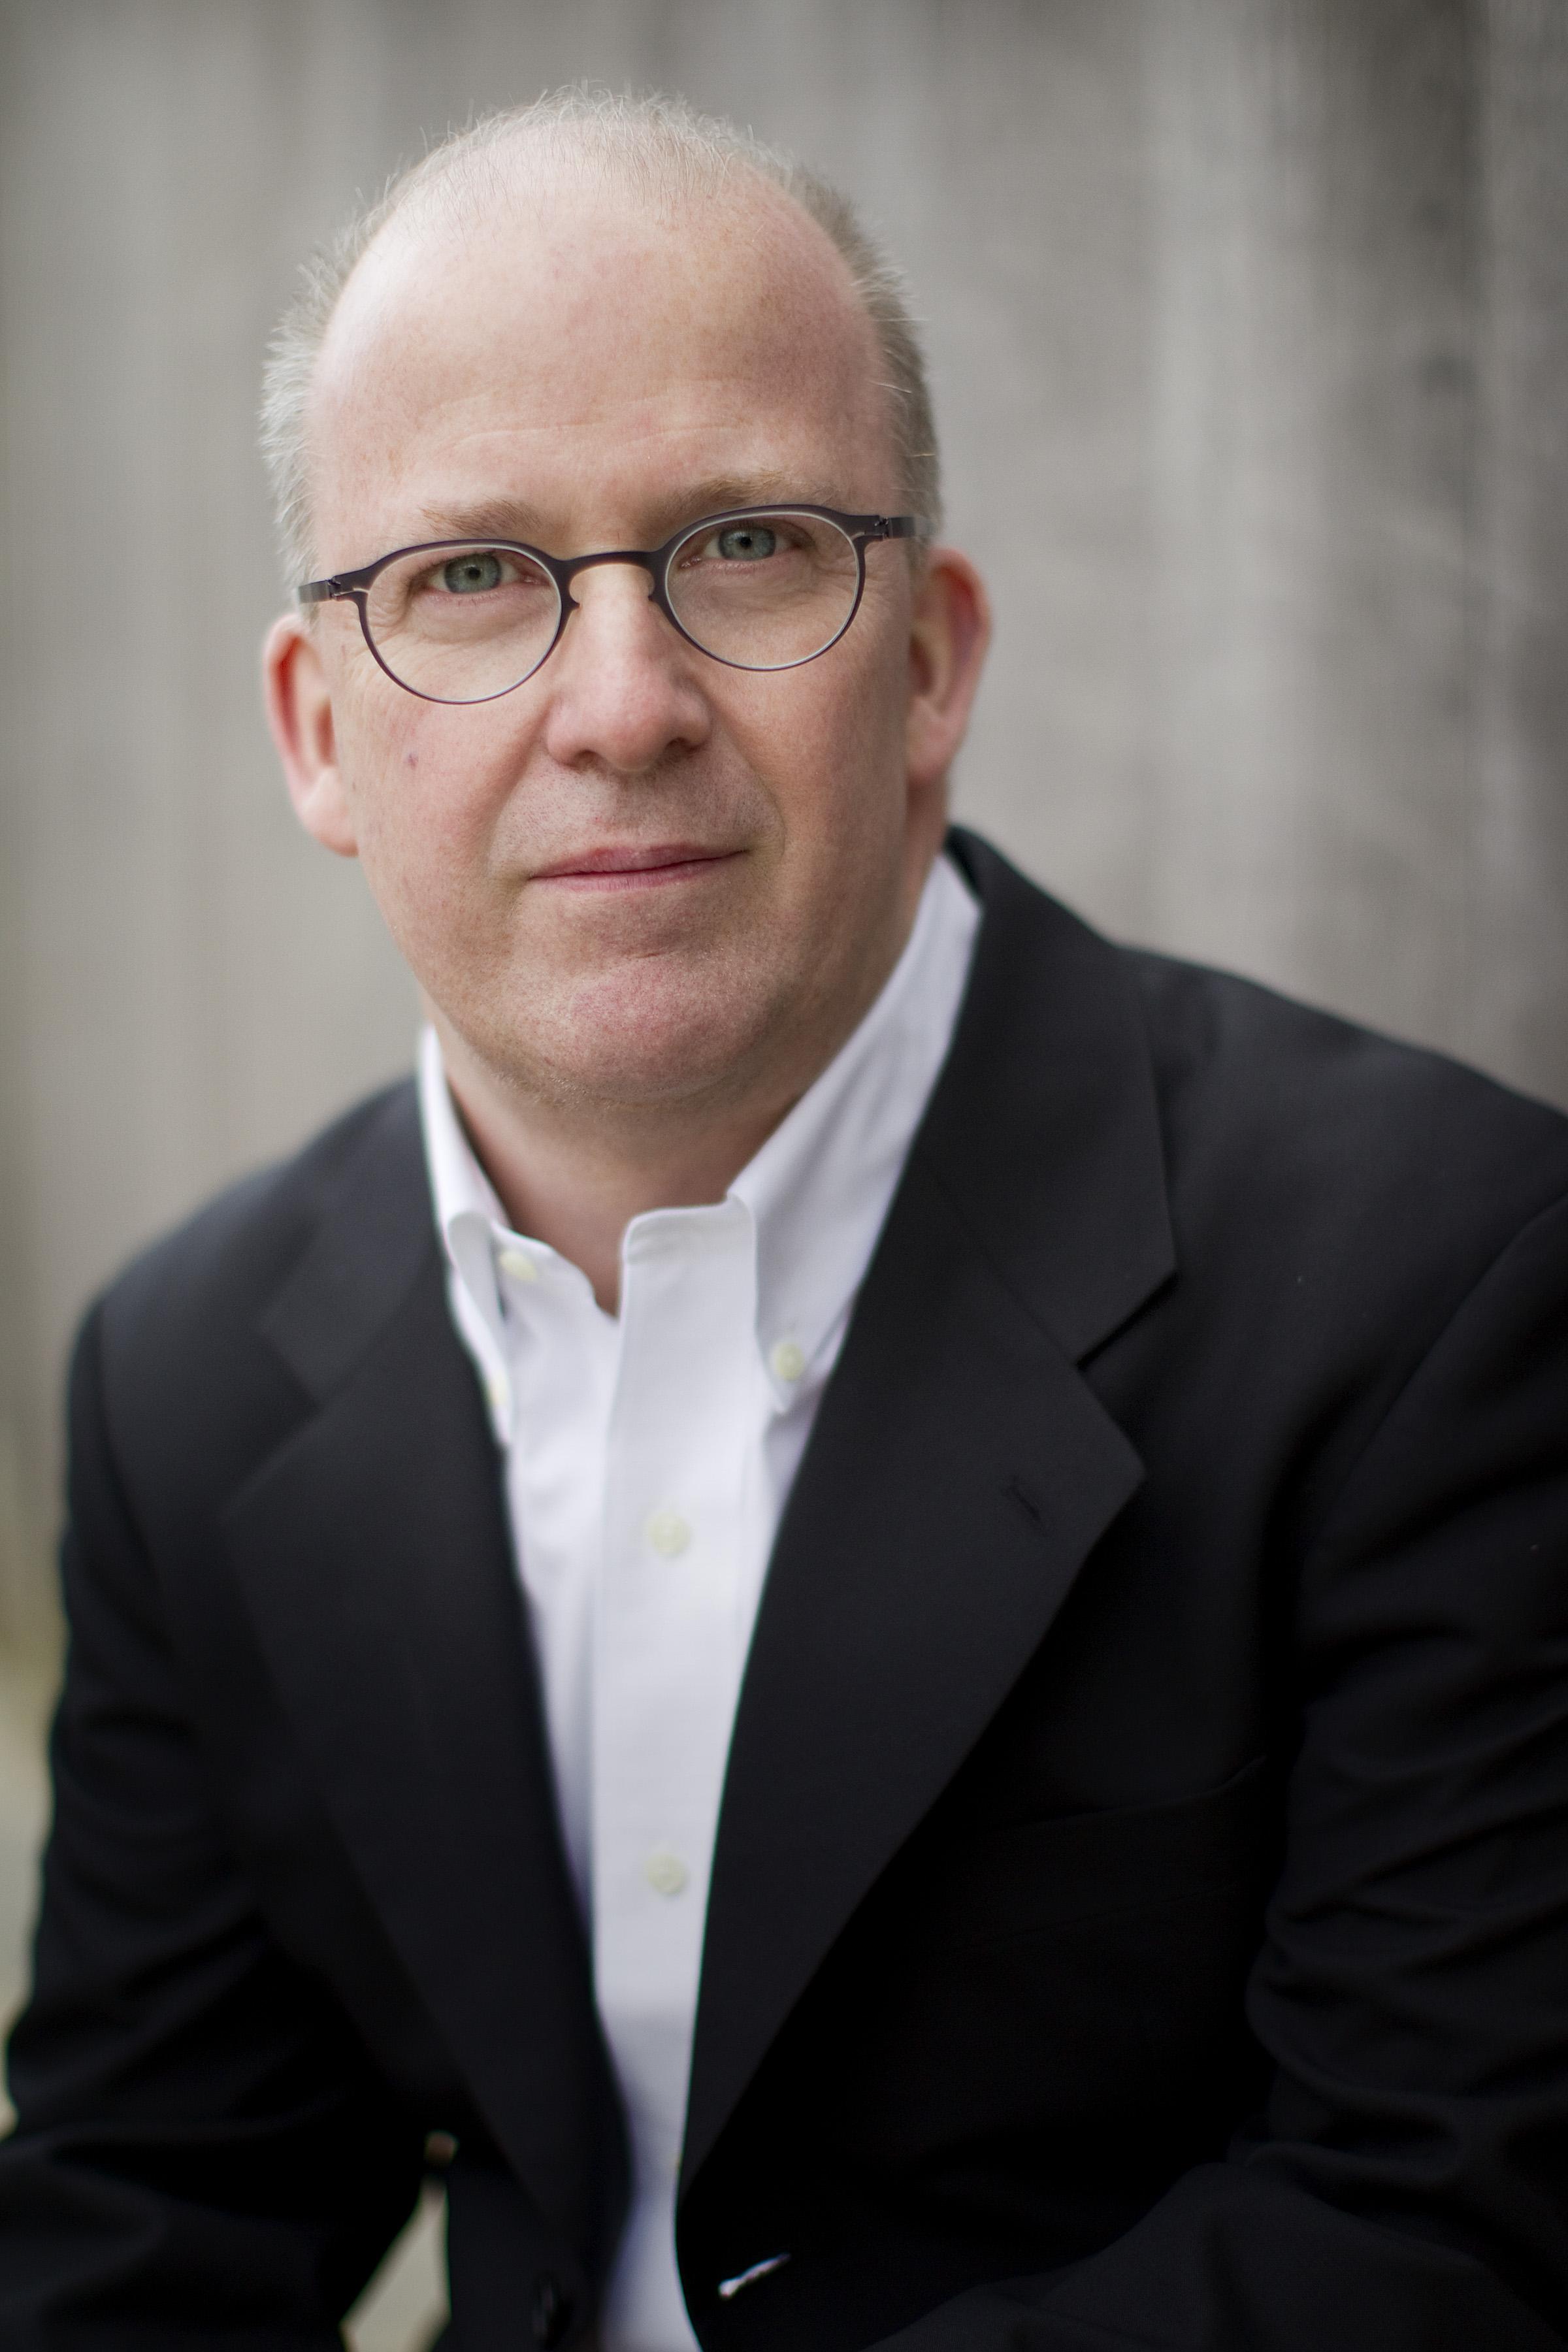 Michael Thomson